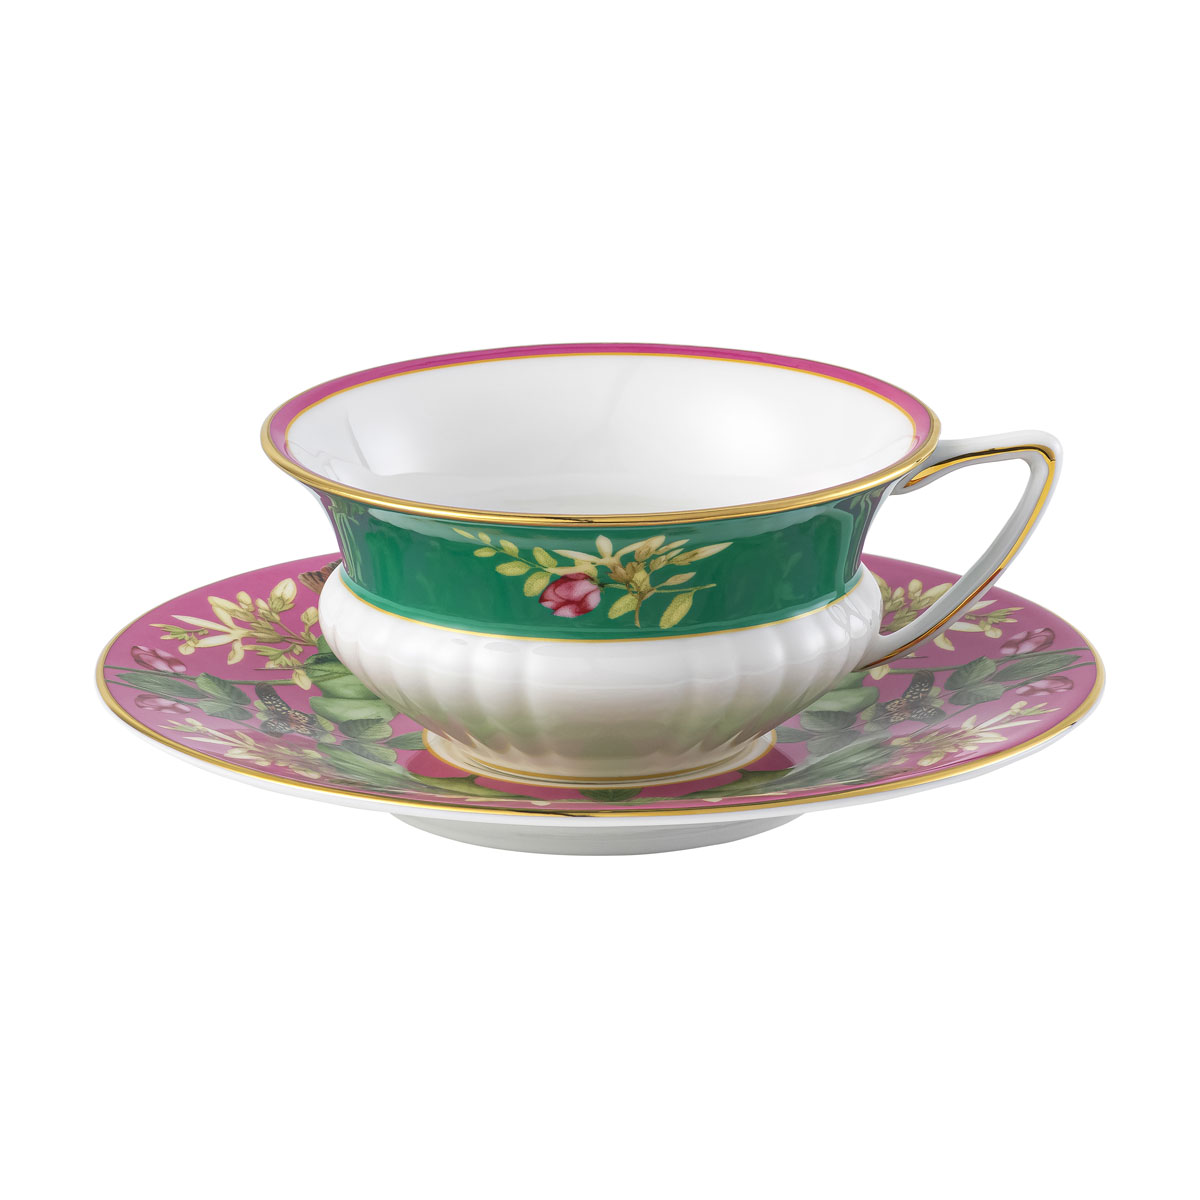 Wedgwood Wonderlust Pink Lotus Teacup and Saucer